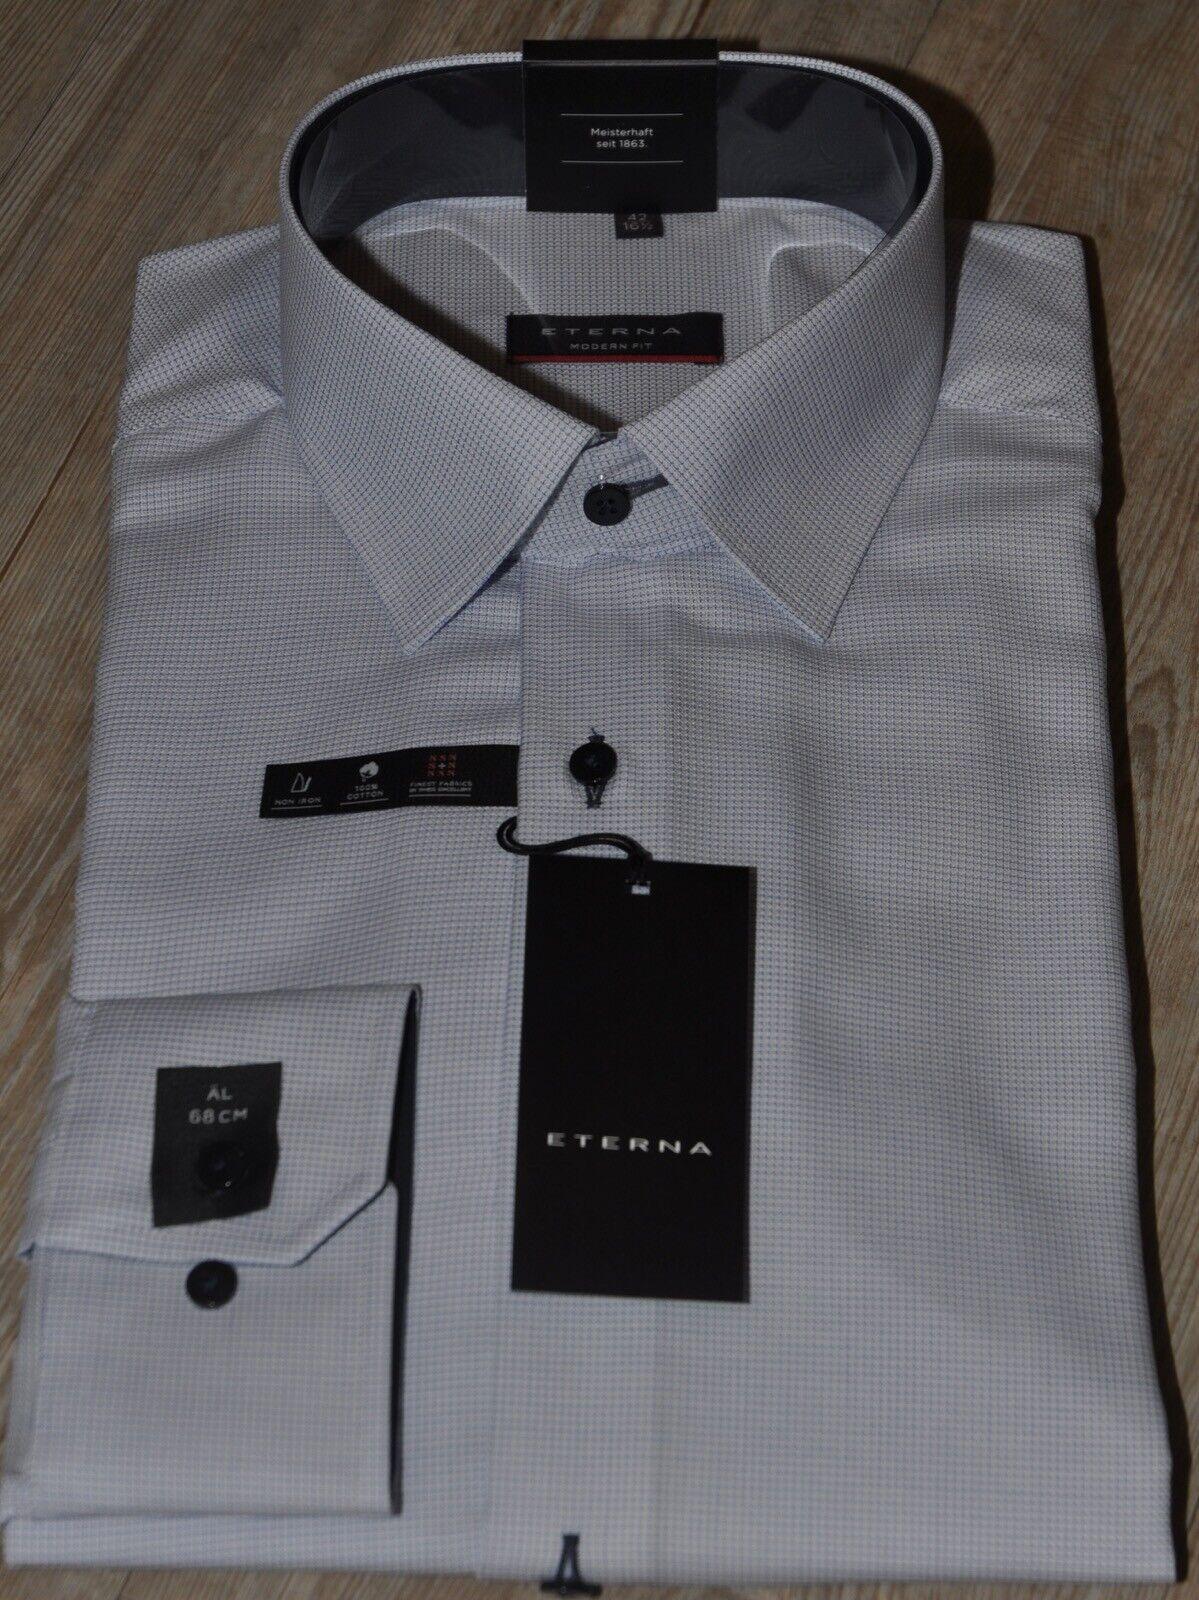 Eterna City-Hemd extra langer Arm Ärmellänge 68 cm Modern Fit hellblau  | Neues Design